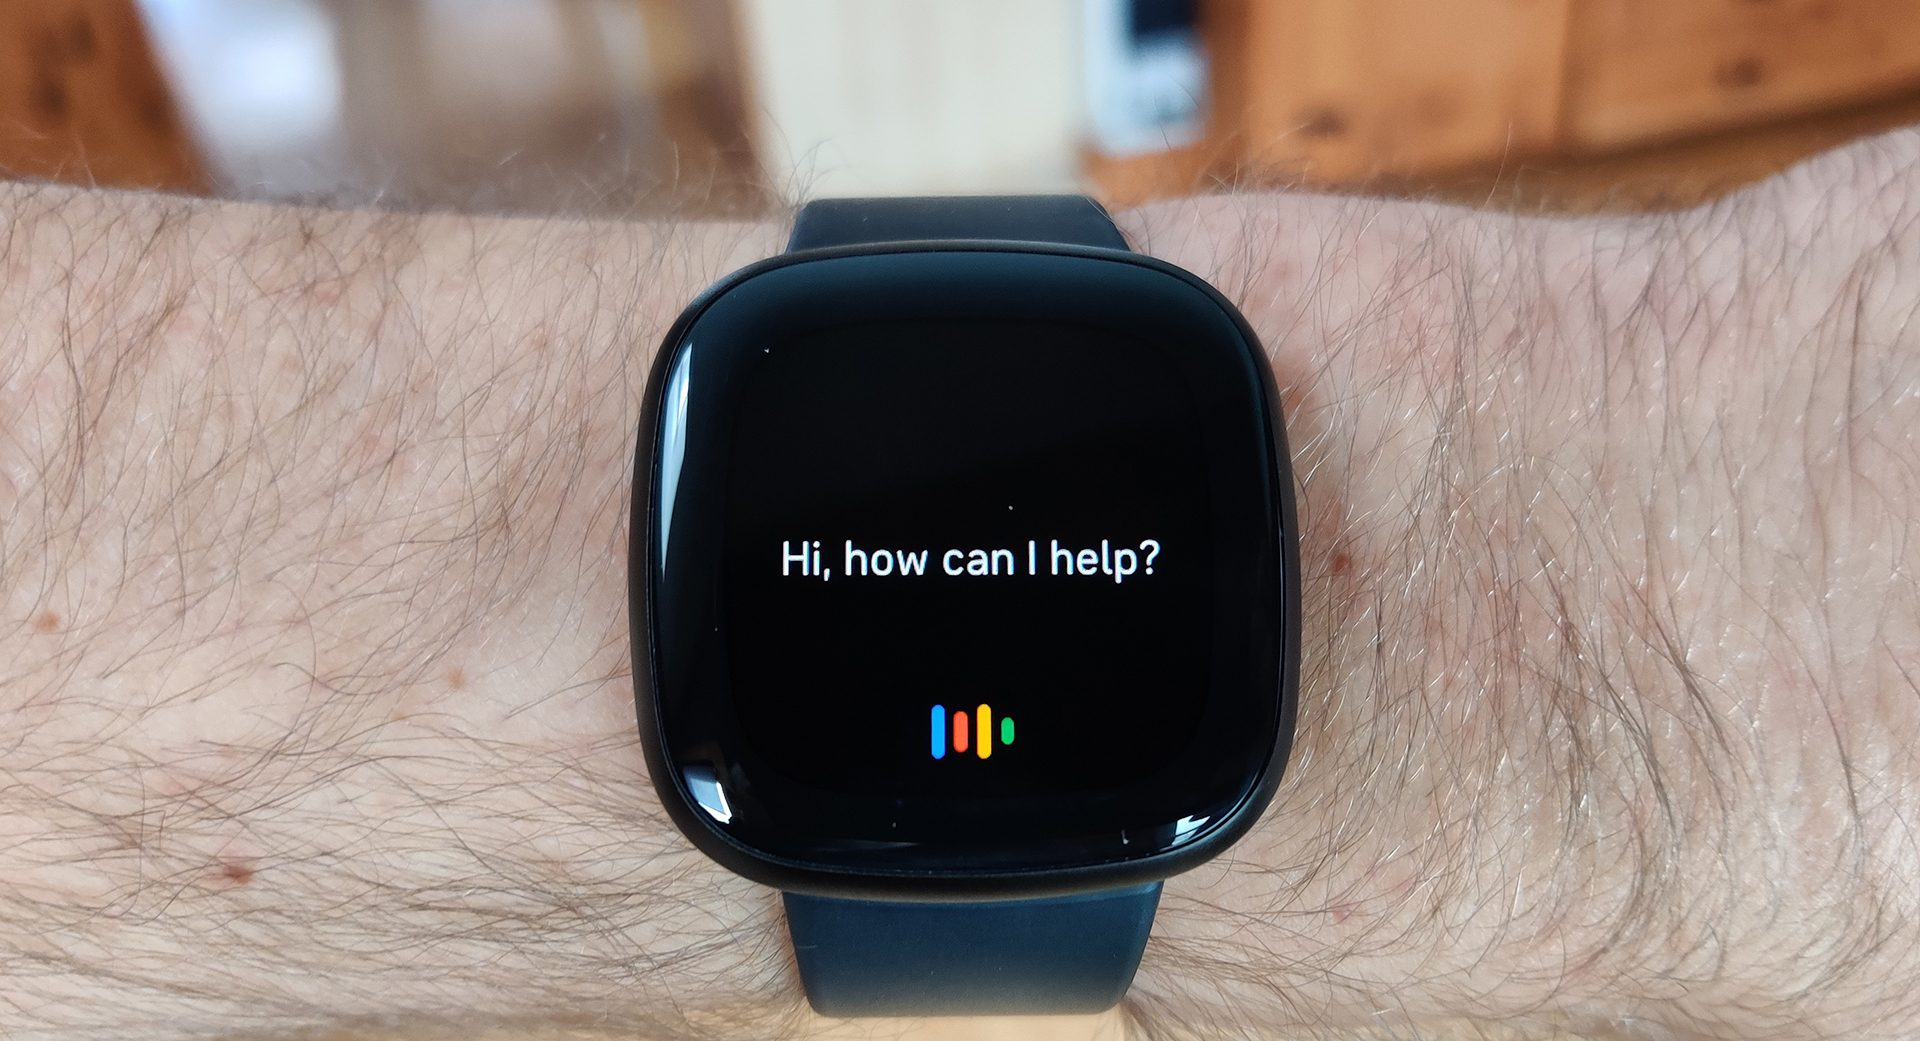 Fitbit-Versa-3-Review-Google-Assistant-Prompt